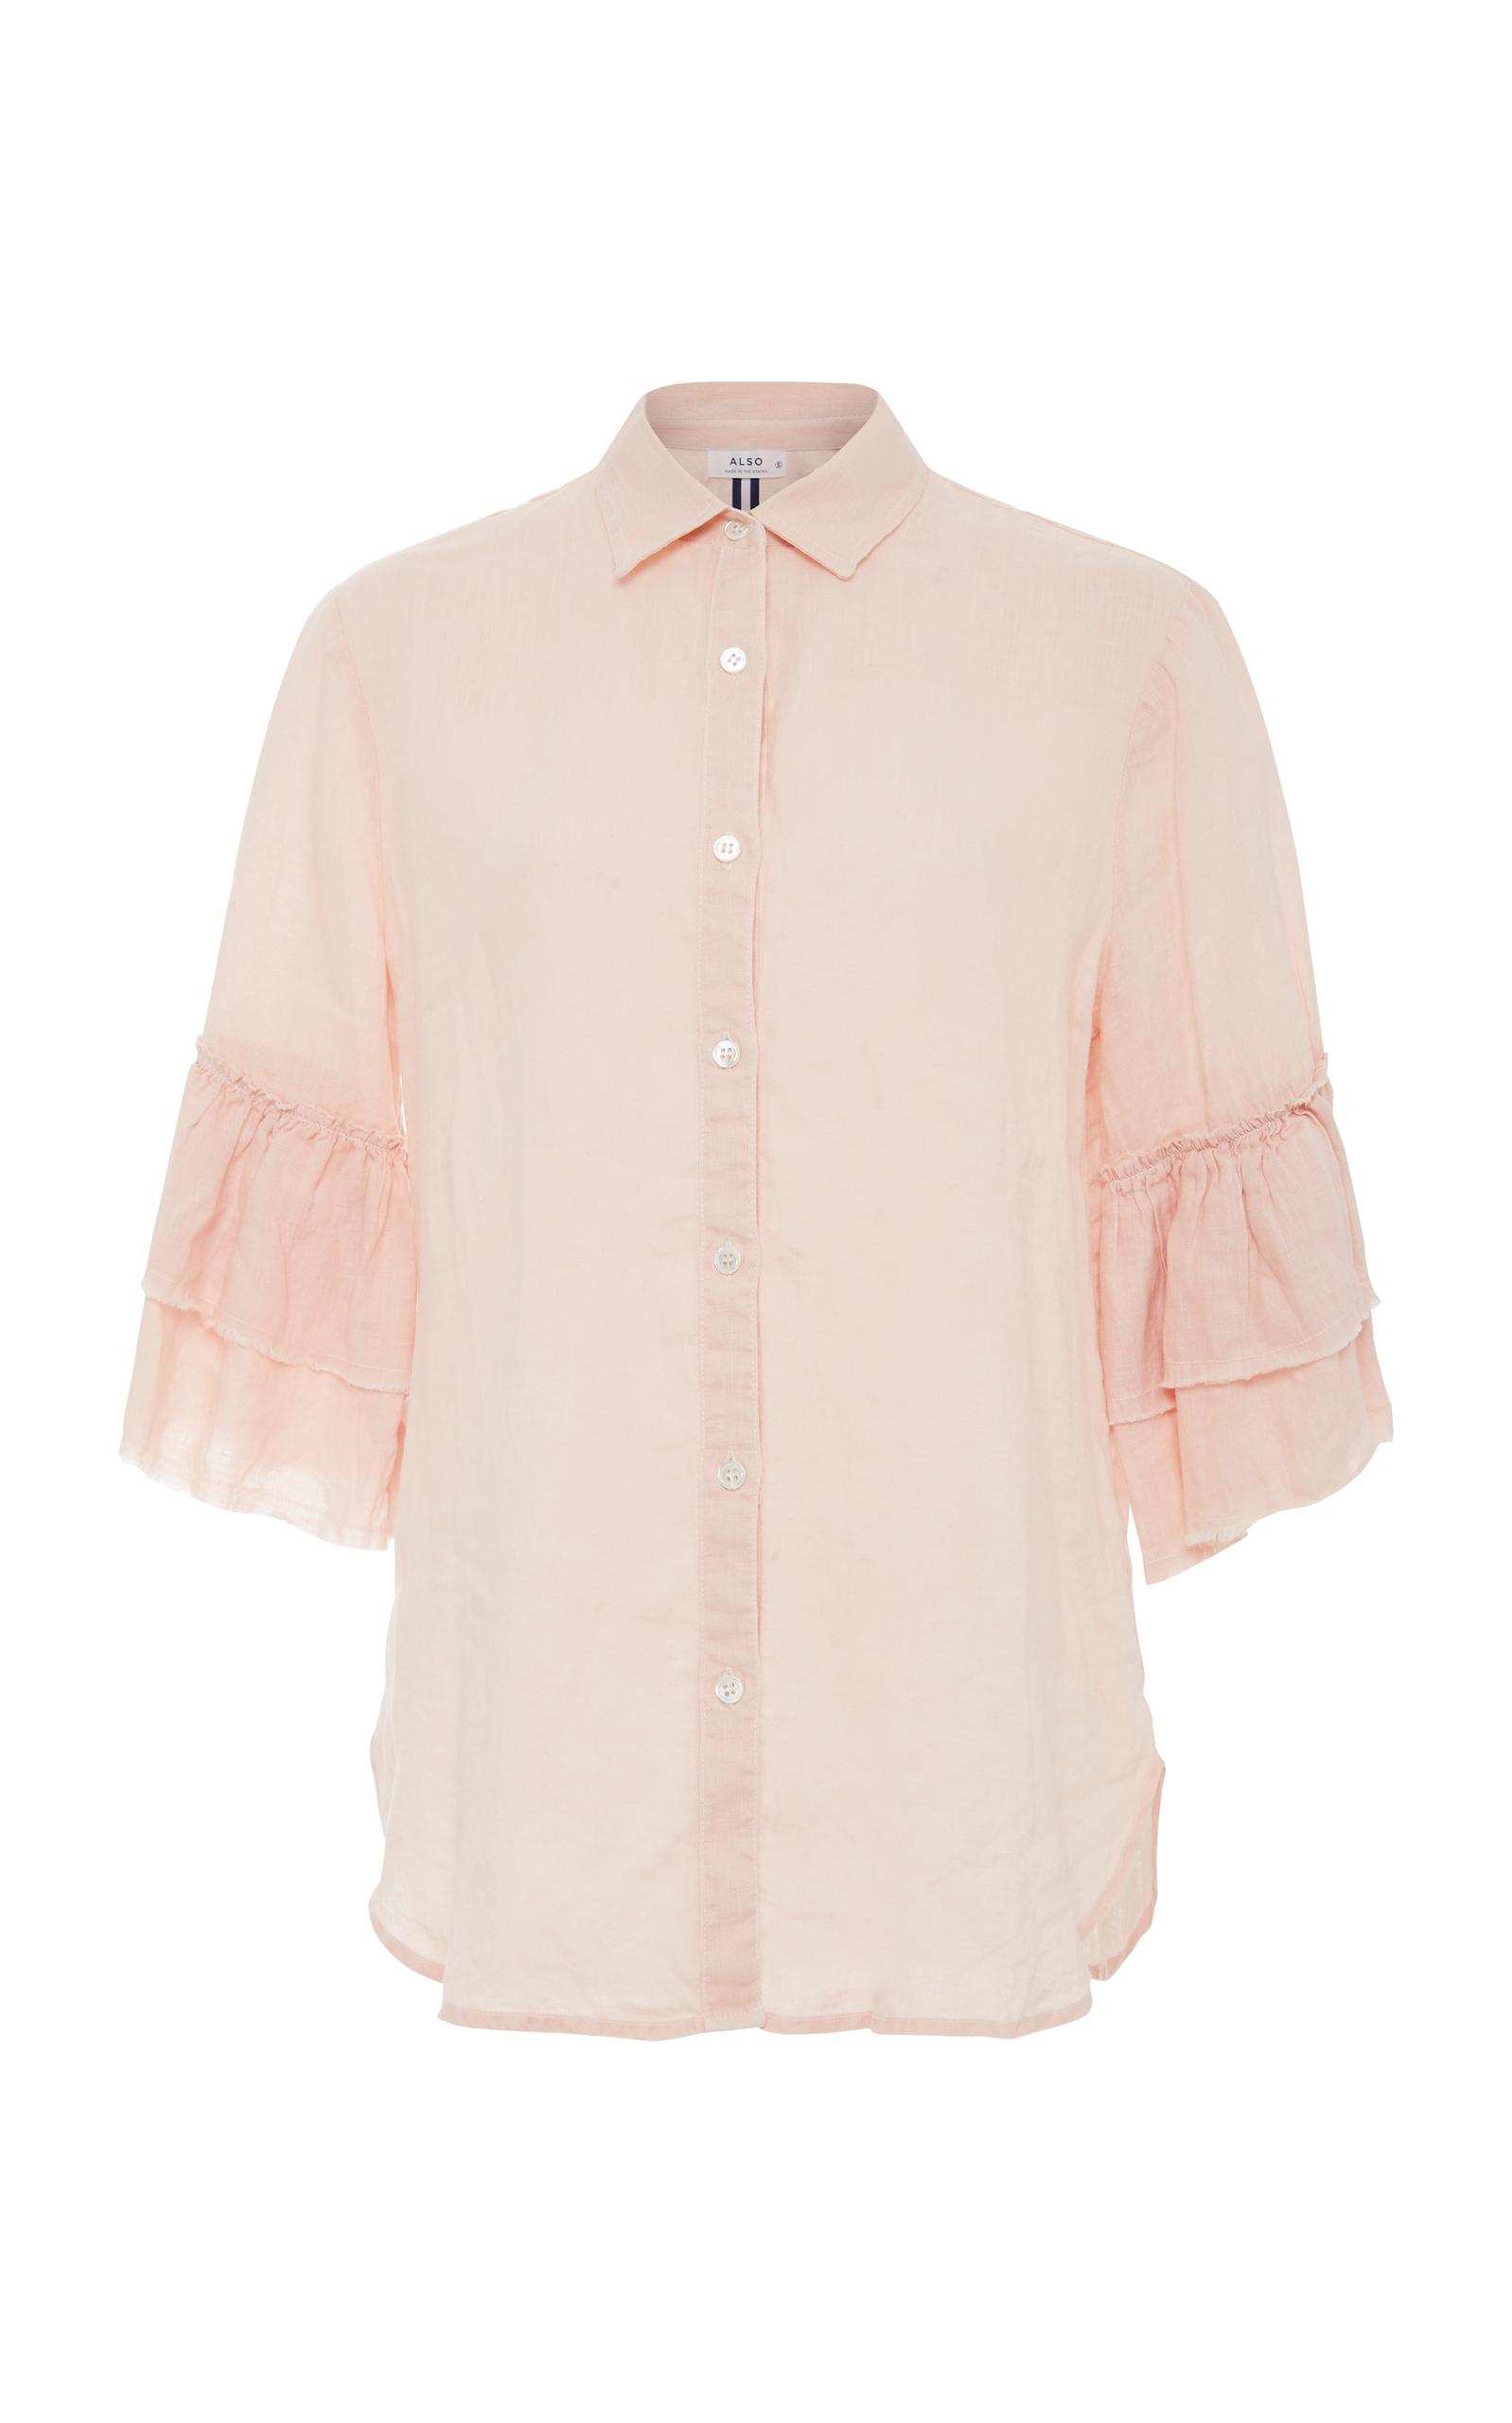 ALSO Josephine Shirt in Pink